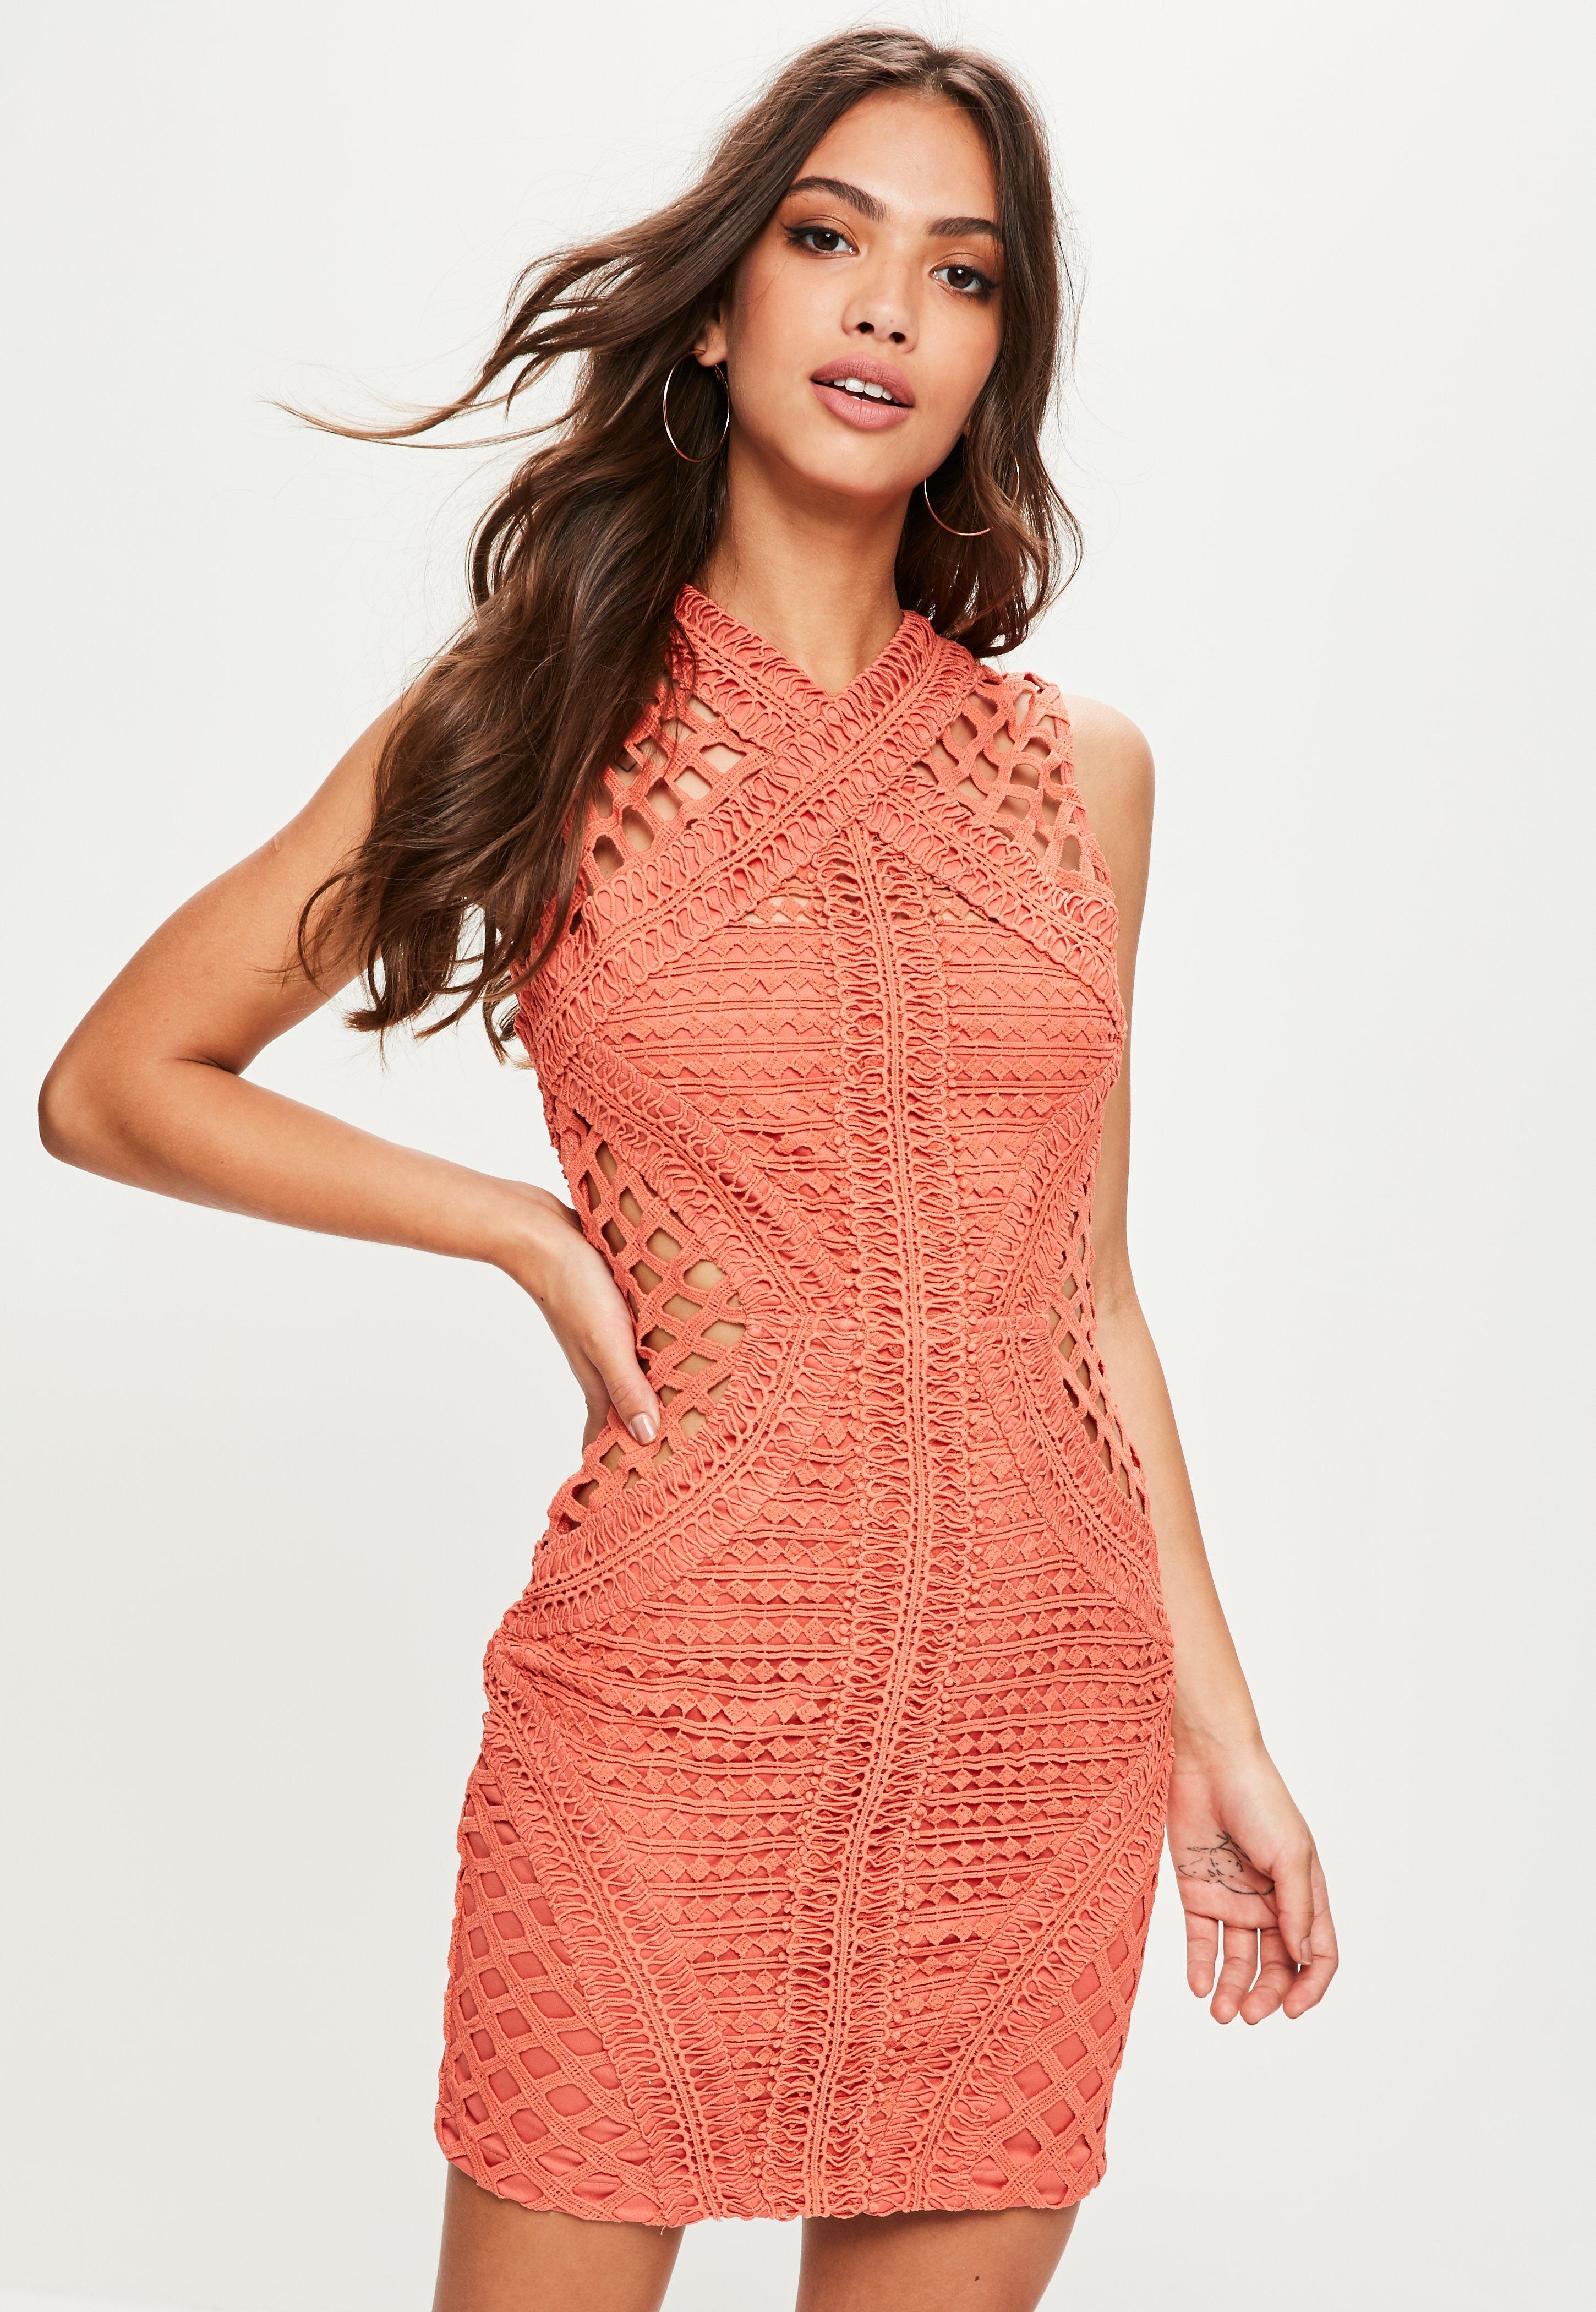 ... Orange High Neck Sleeveless Lace Bodycon Dress